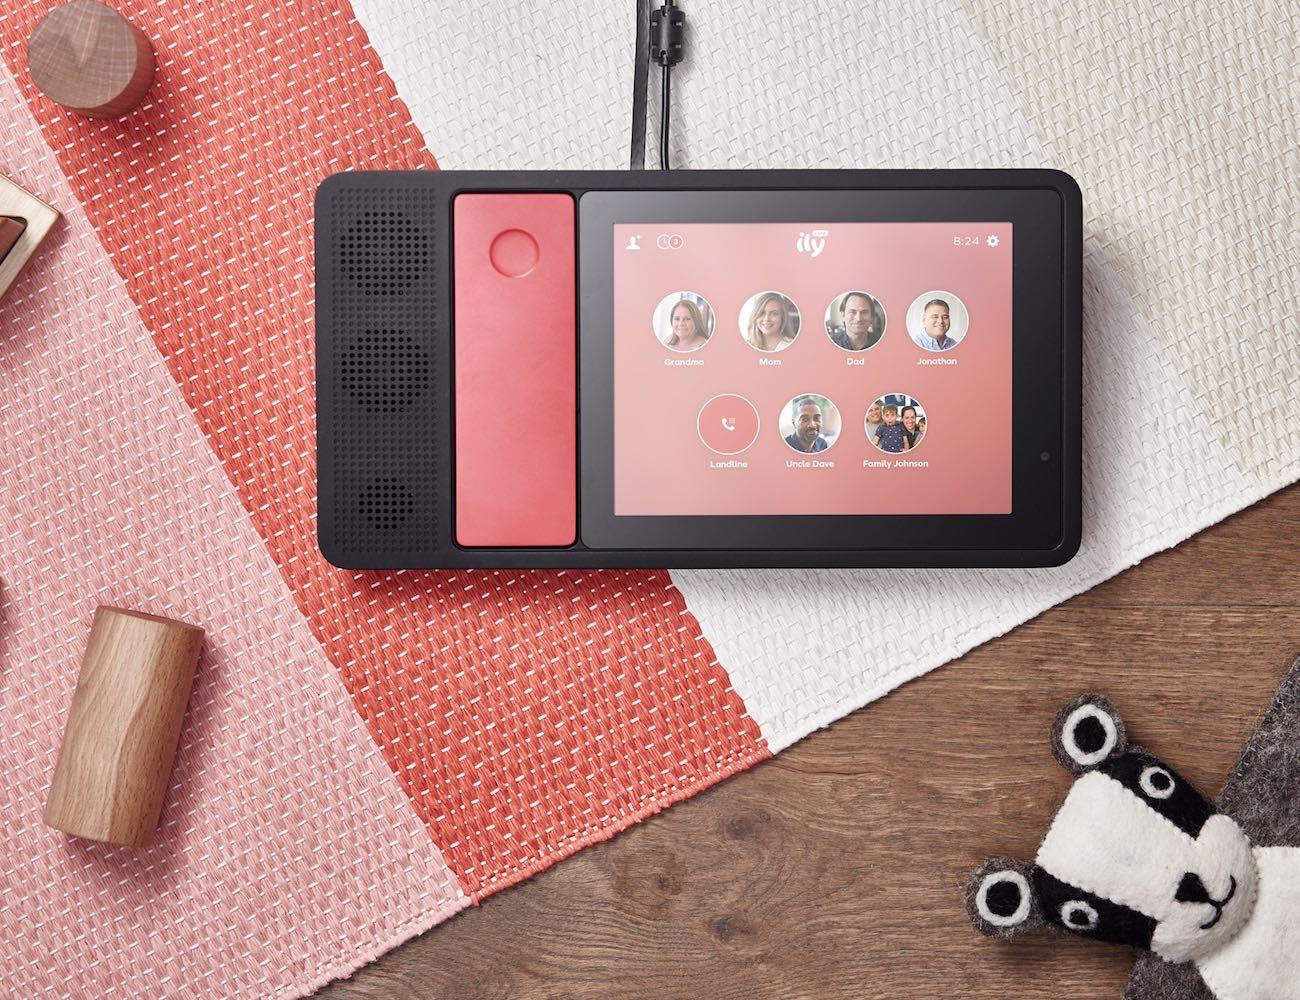 Ily – The Family Phone